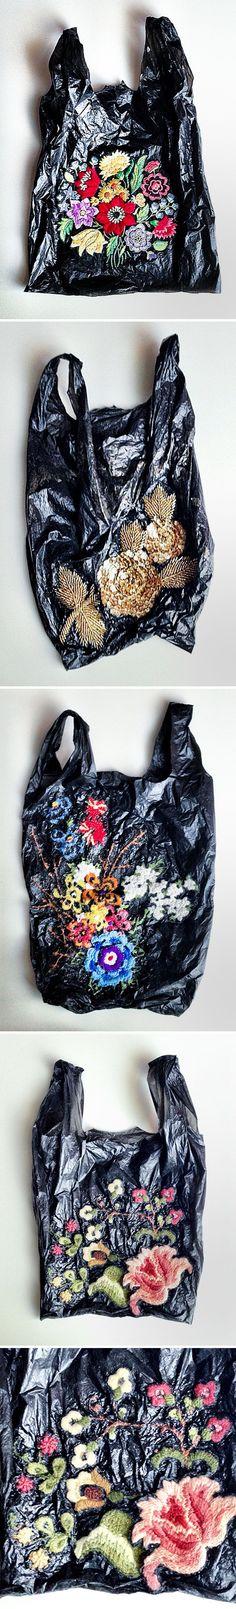 embroidery on plastic bags ♥️ nicoletta dela brown